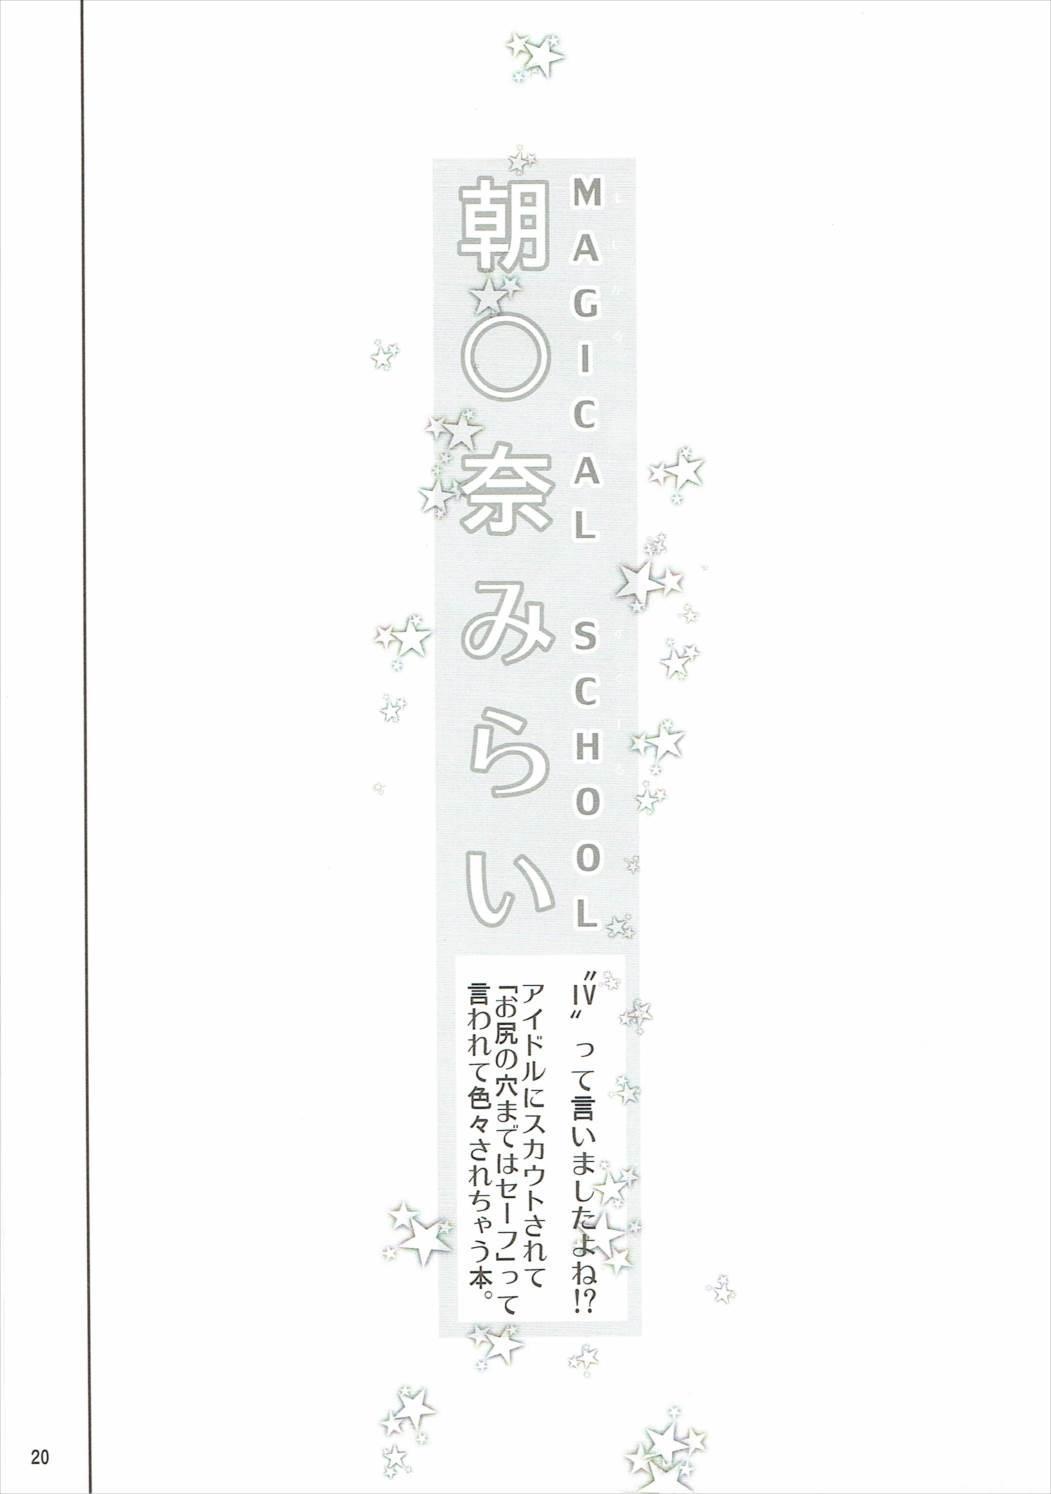 Amanogawa Kirara + Himelda + Mapuri Soushuuhen 18